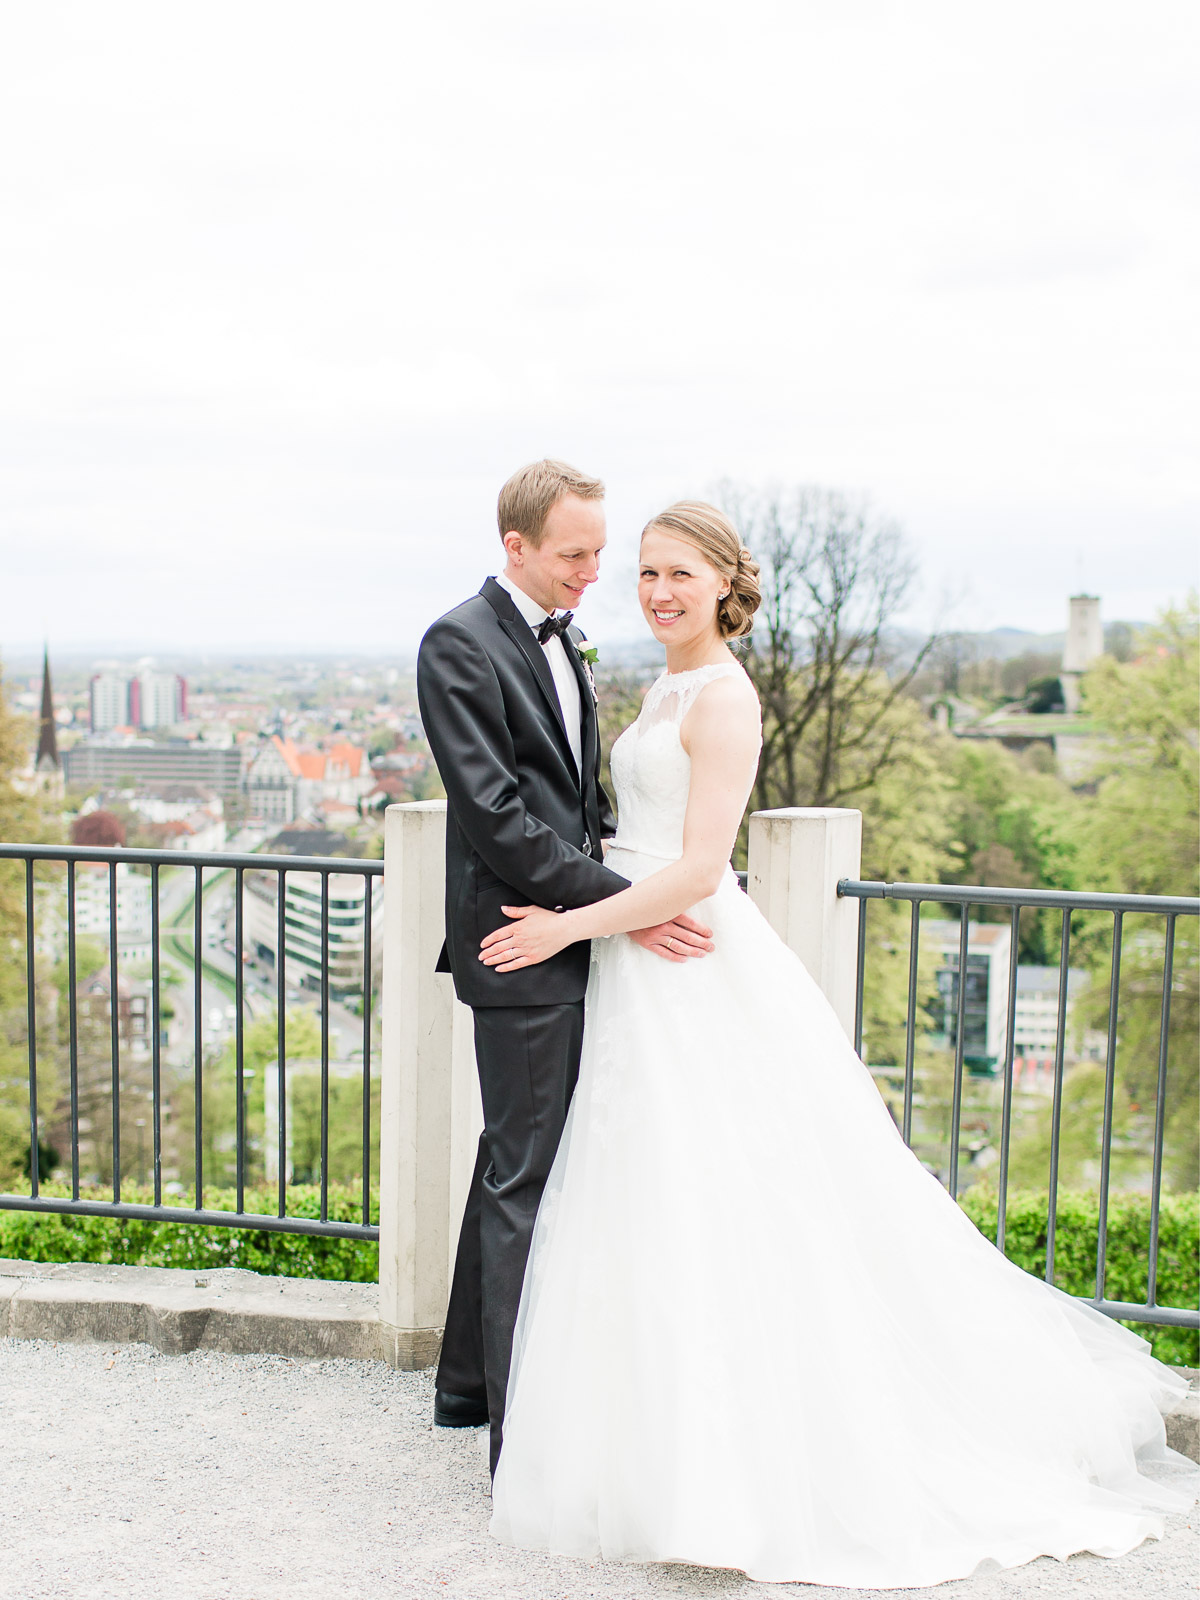 Hochzeitsfotograf-Bielefeld-2016-04-23063